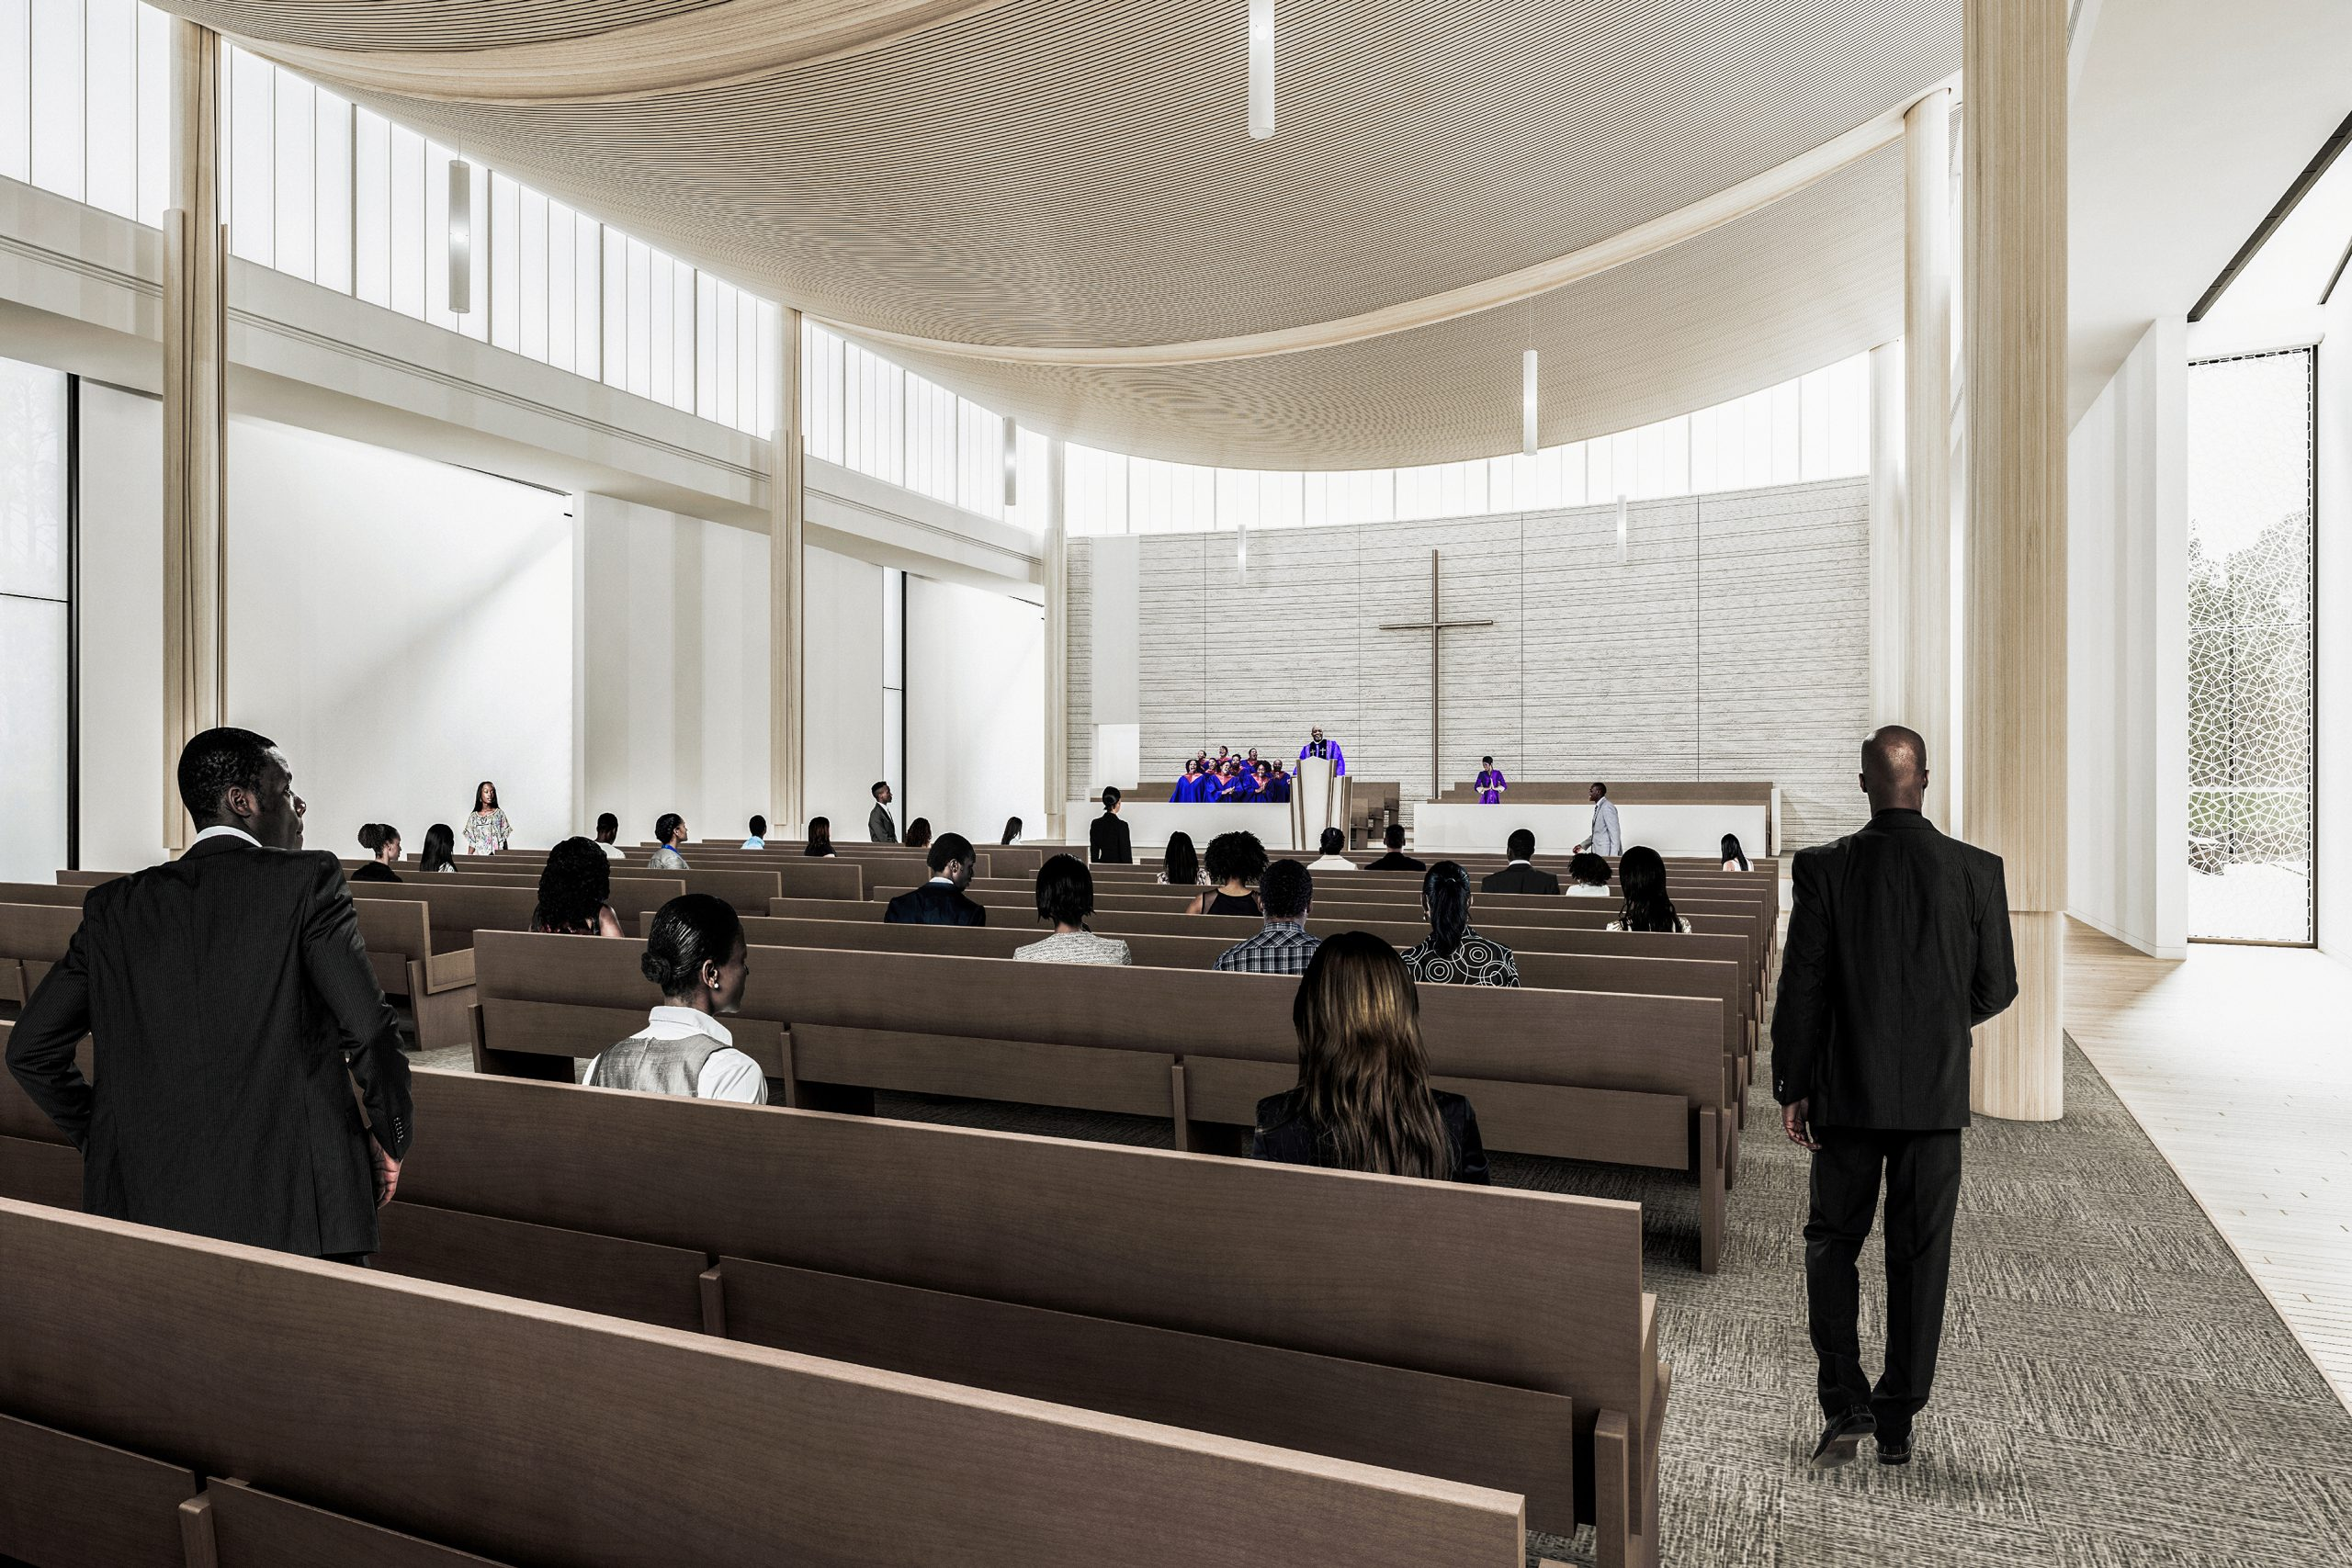 Mount Vernon Missionary Baptist Church 008